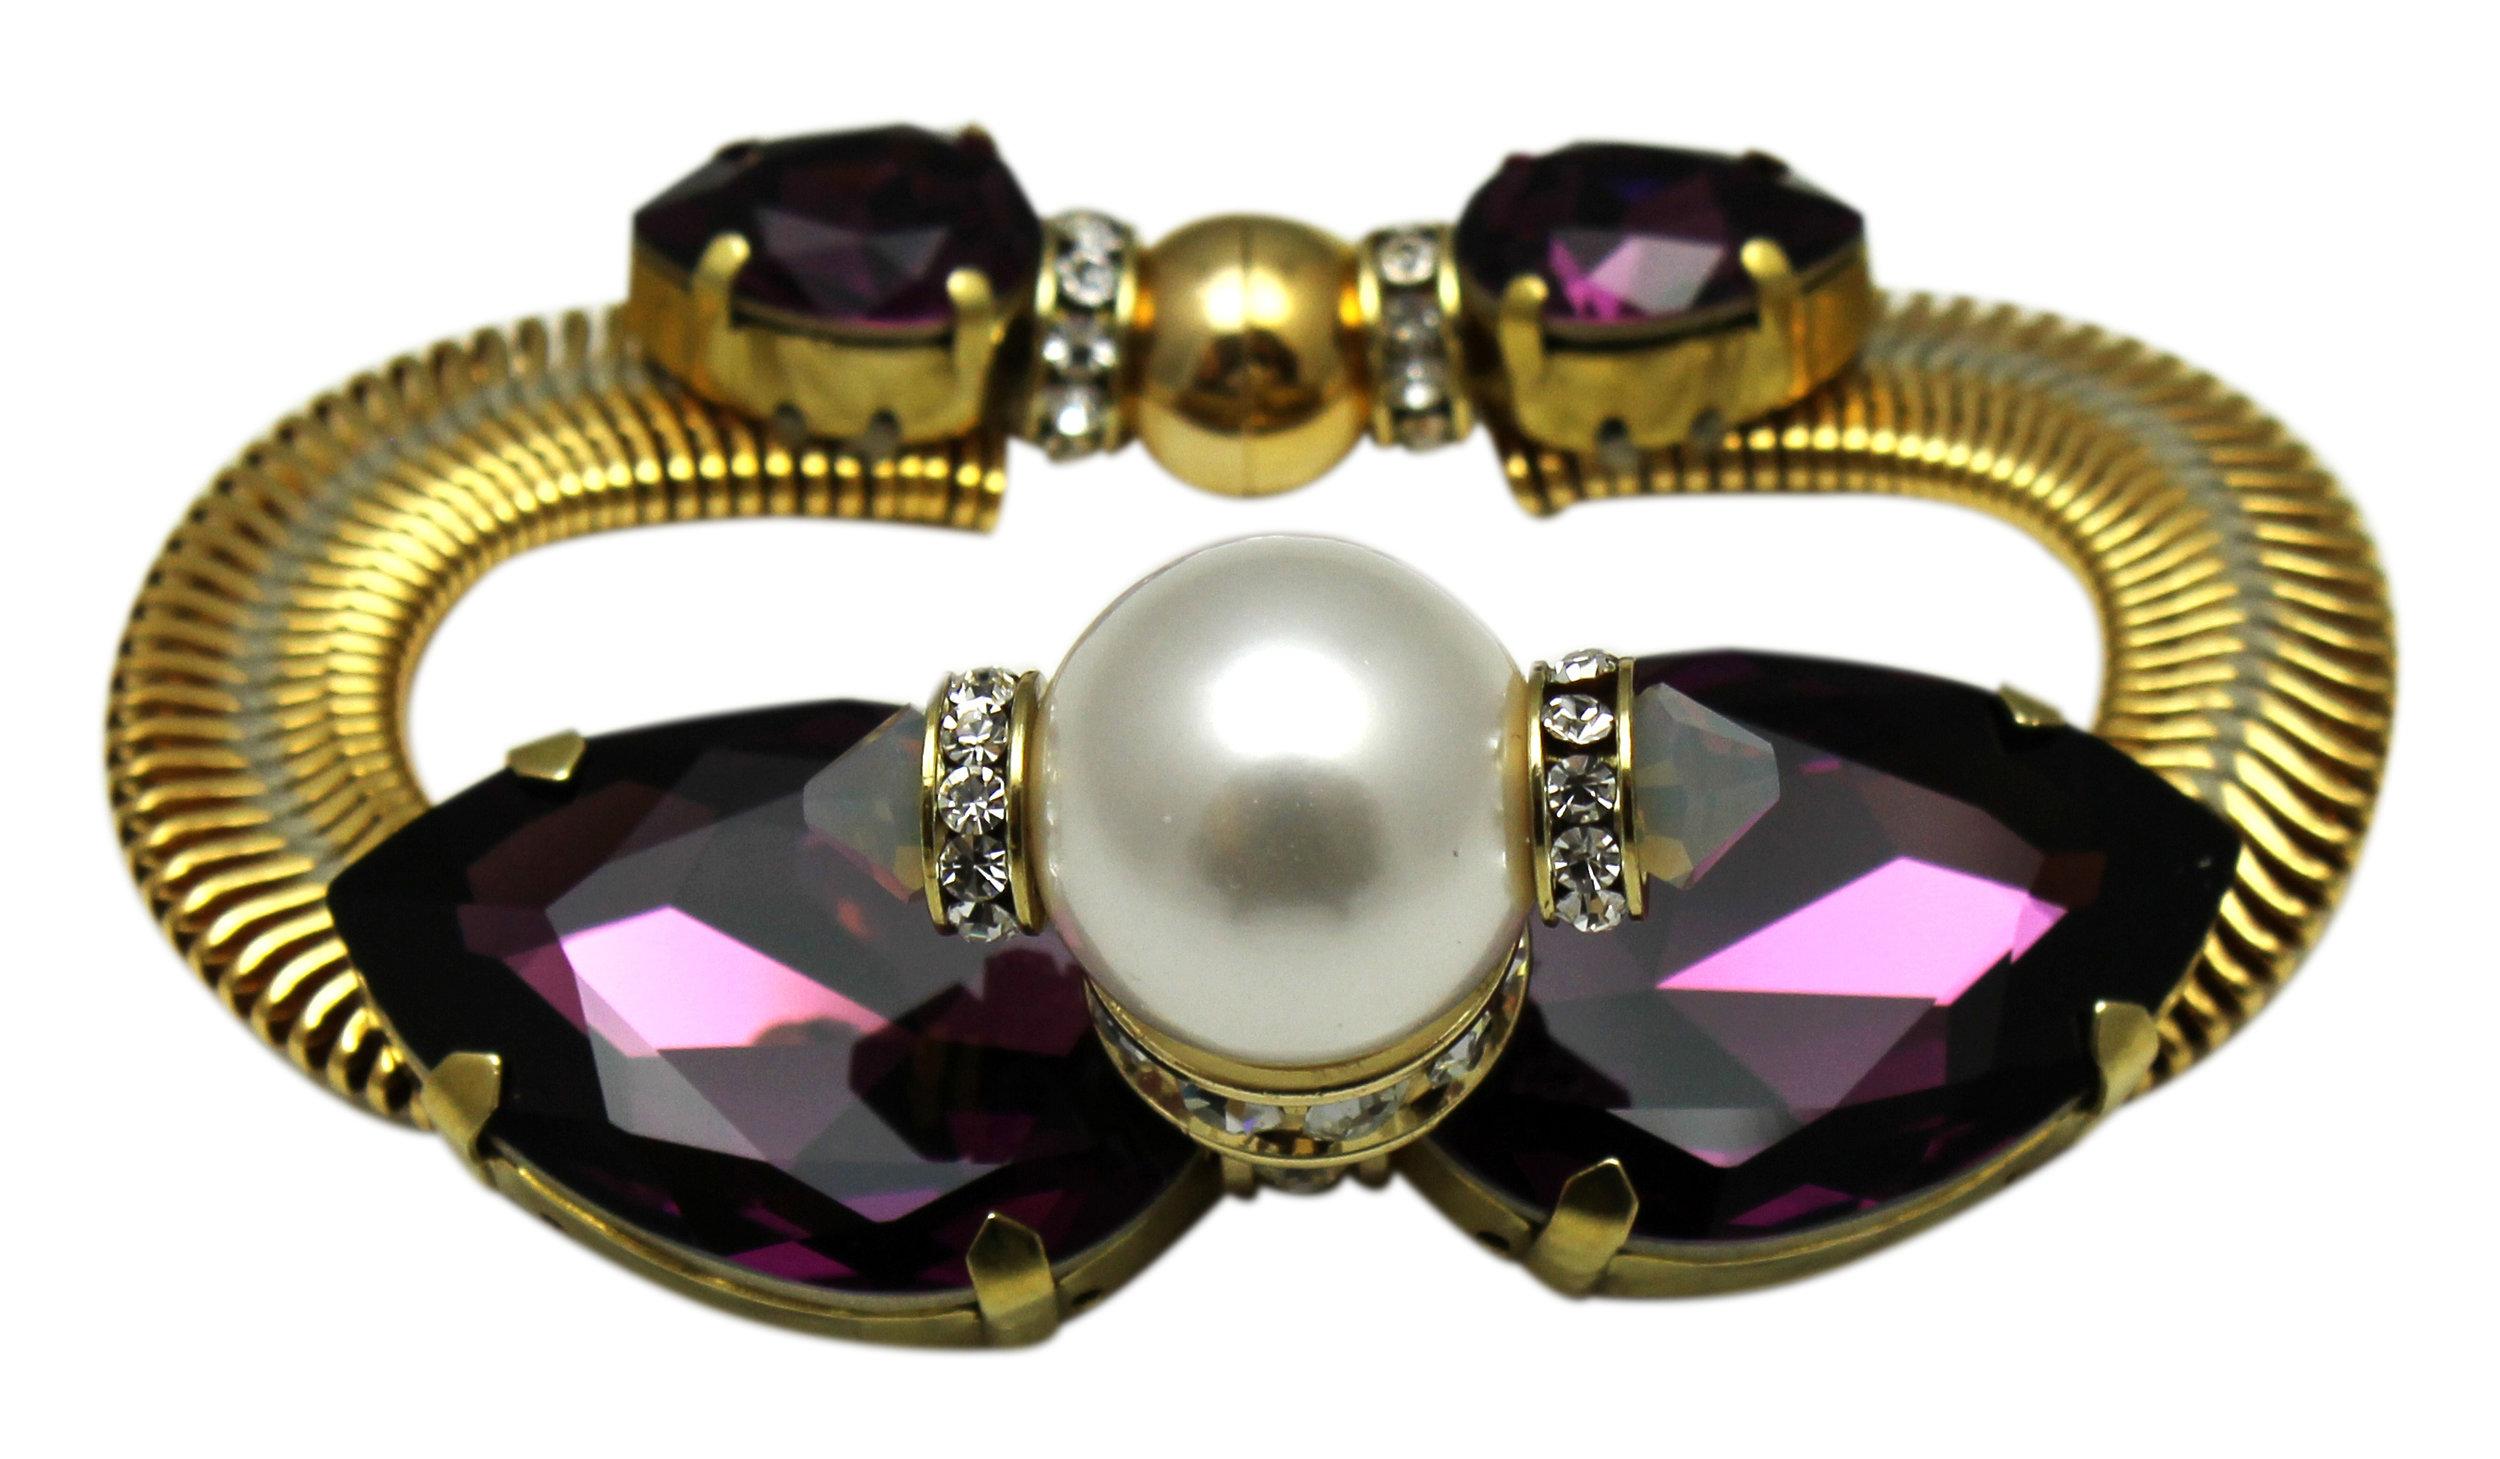 179B-PW Monaco Bracelet - Purple_White (C1).JPG